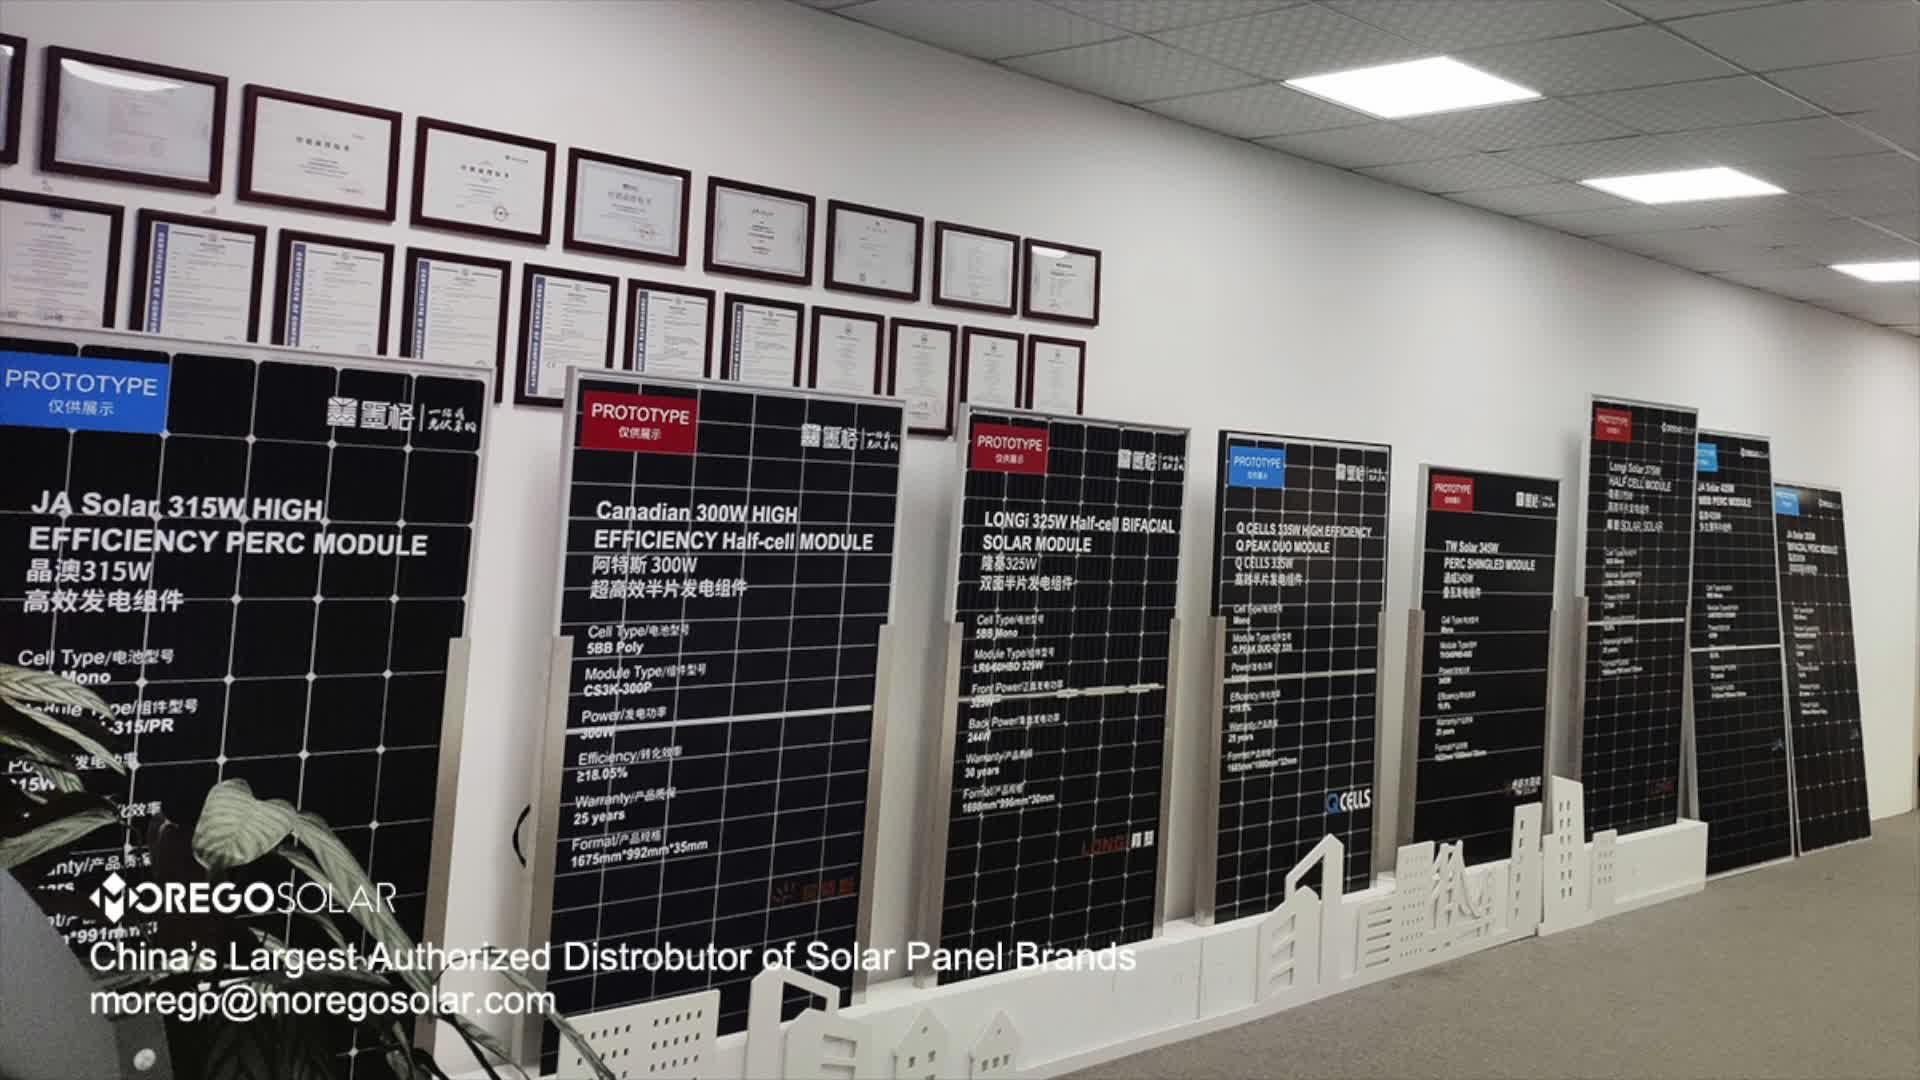 Moregosolar verteilen JA/Longi/Q zellen/Trina/Kanadischen solarzelle panels tier 1 solar panel